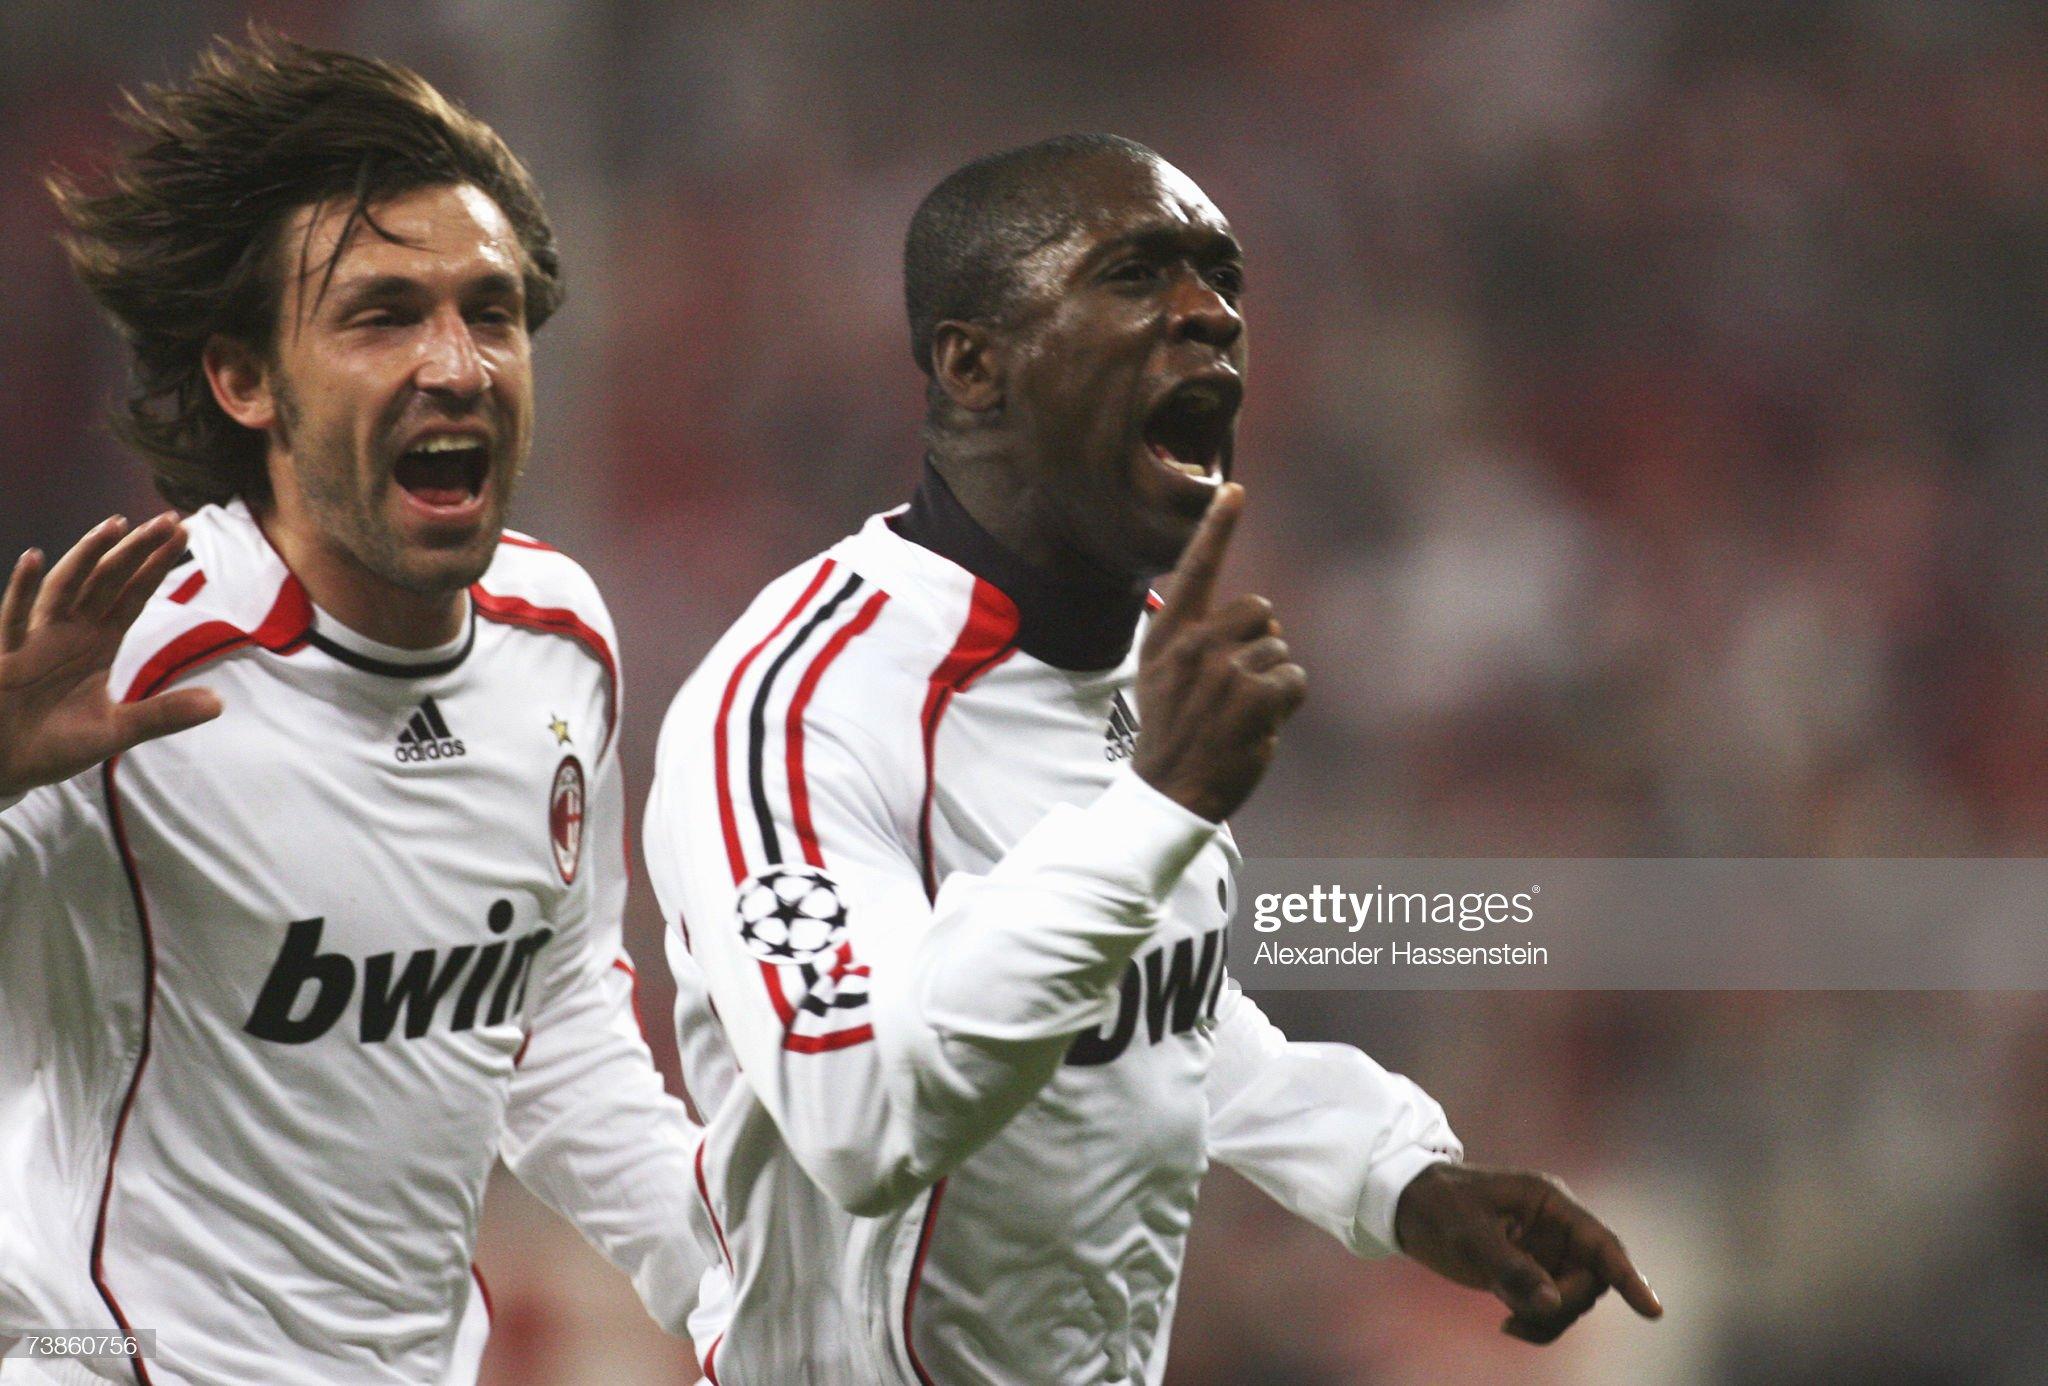 UEFA Champions League Quarter Final: Bayern Munich v AC Milan : News Photo